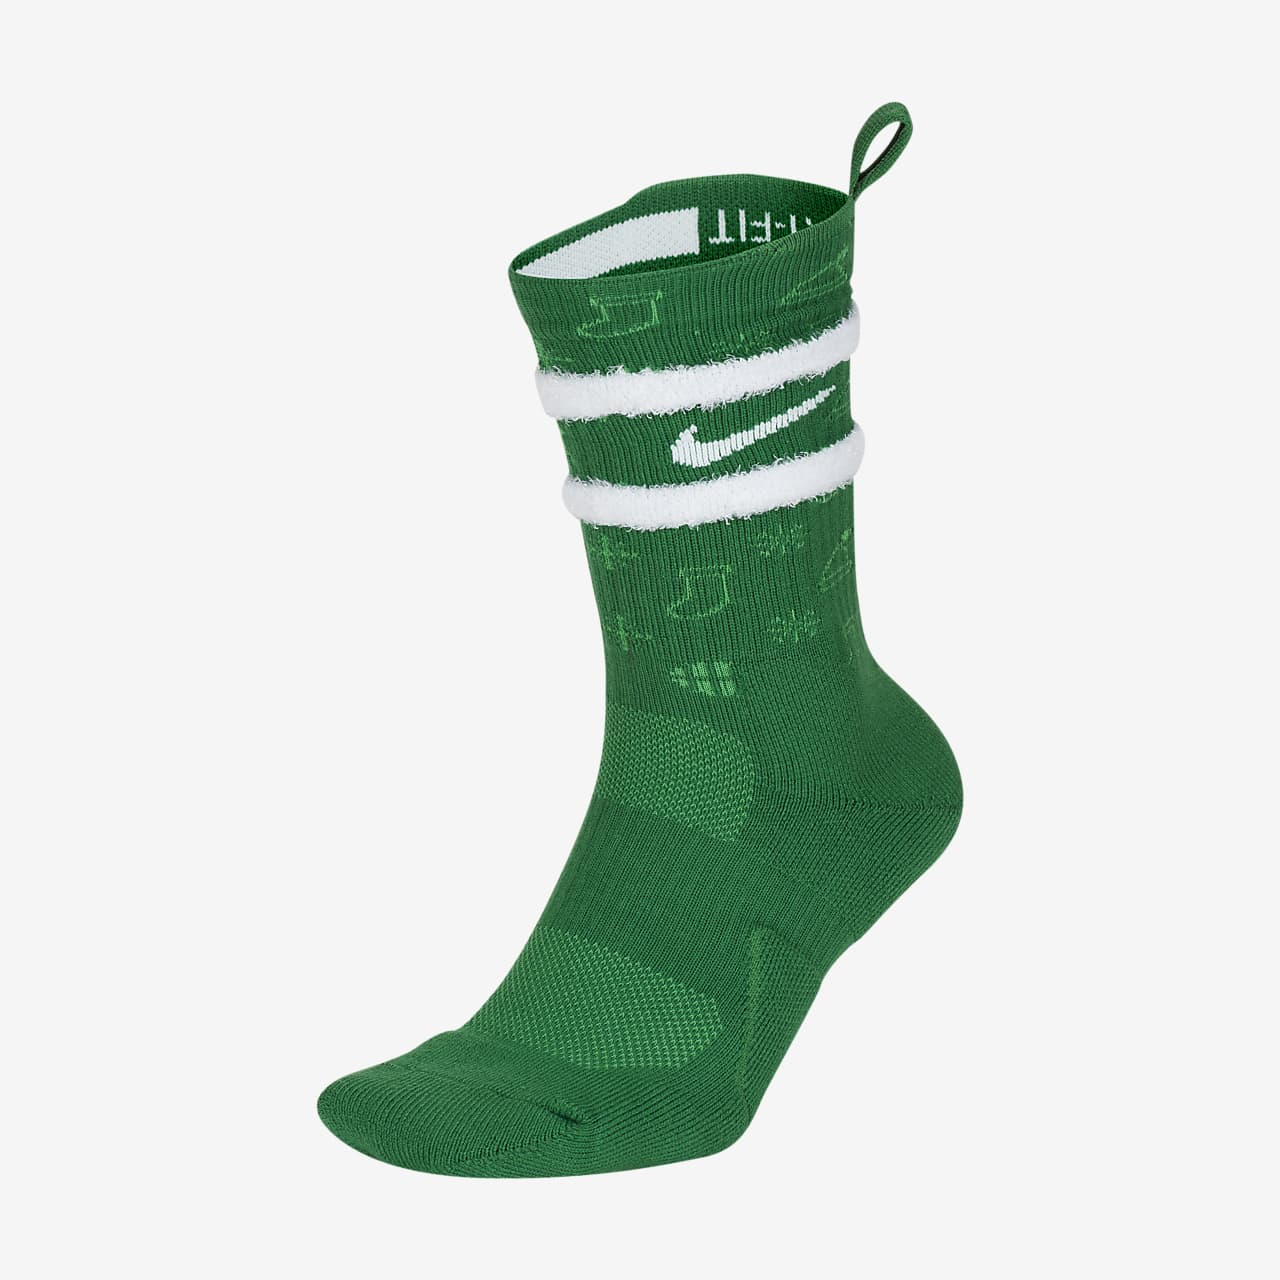 Nike Elite Crew 'Xmas' Basketball Socks CK6786-312